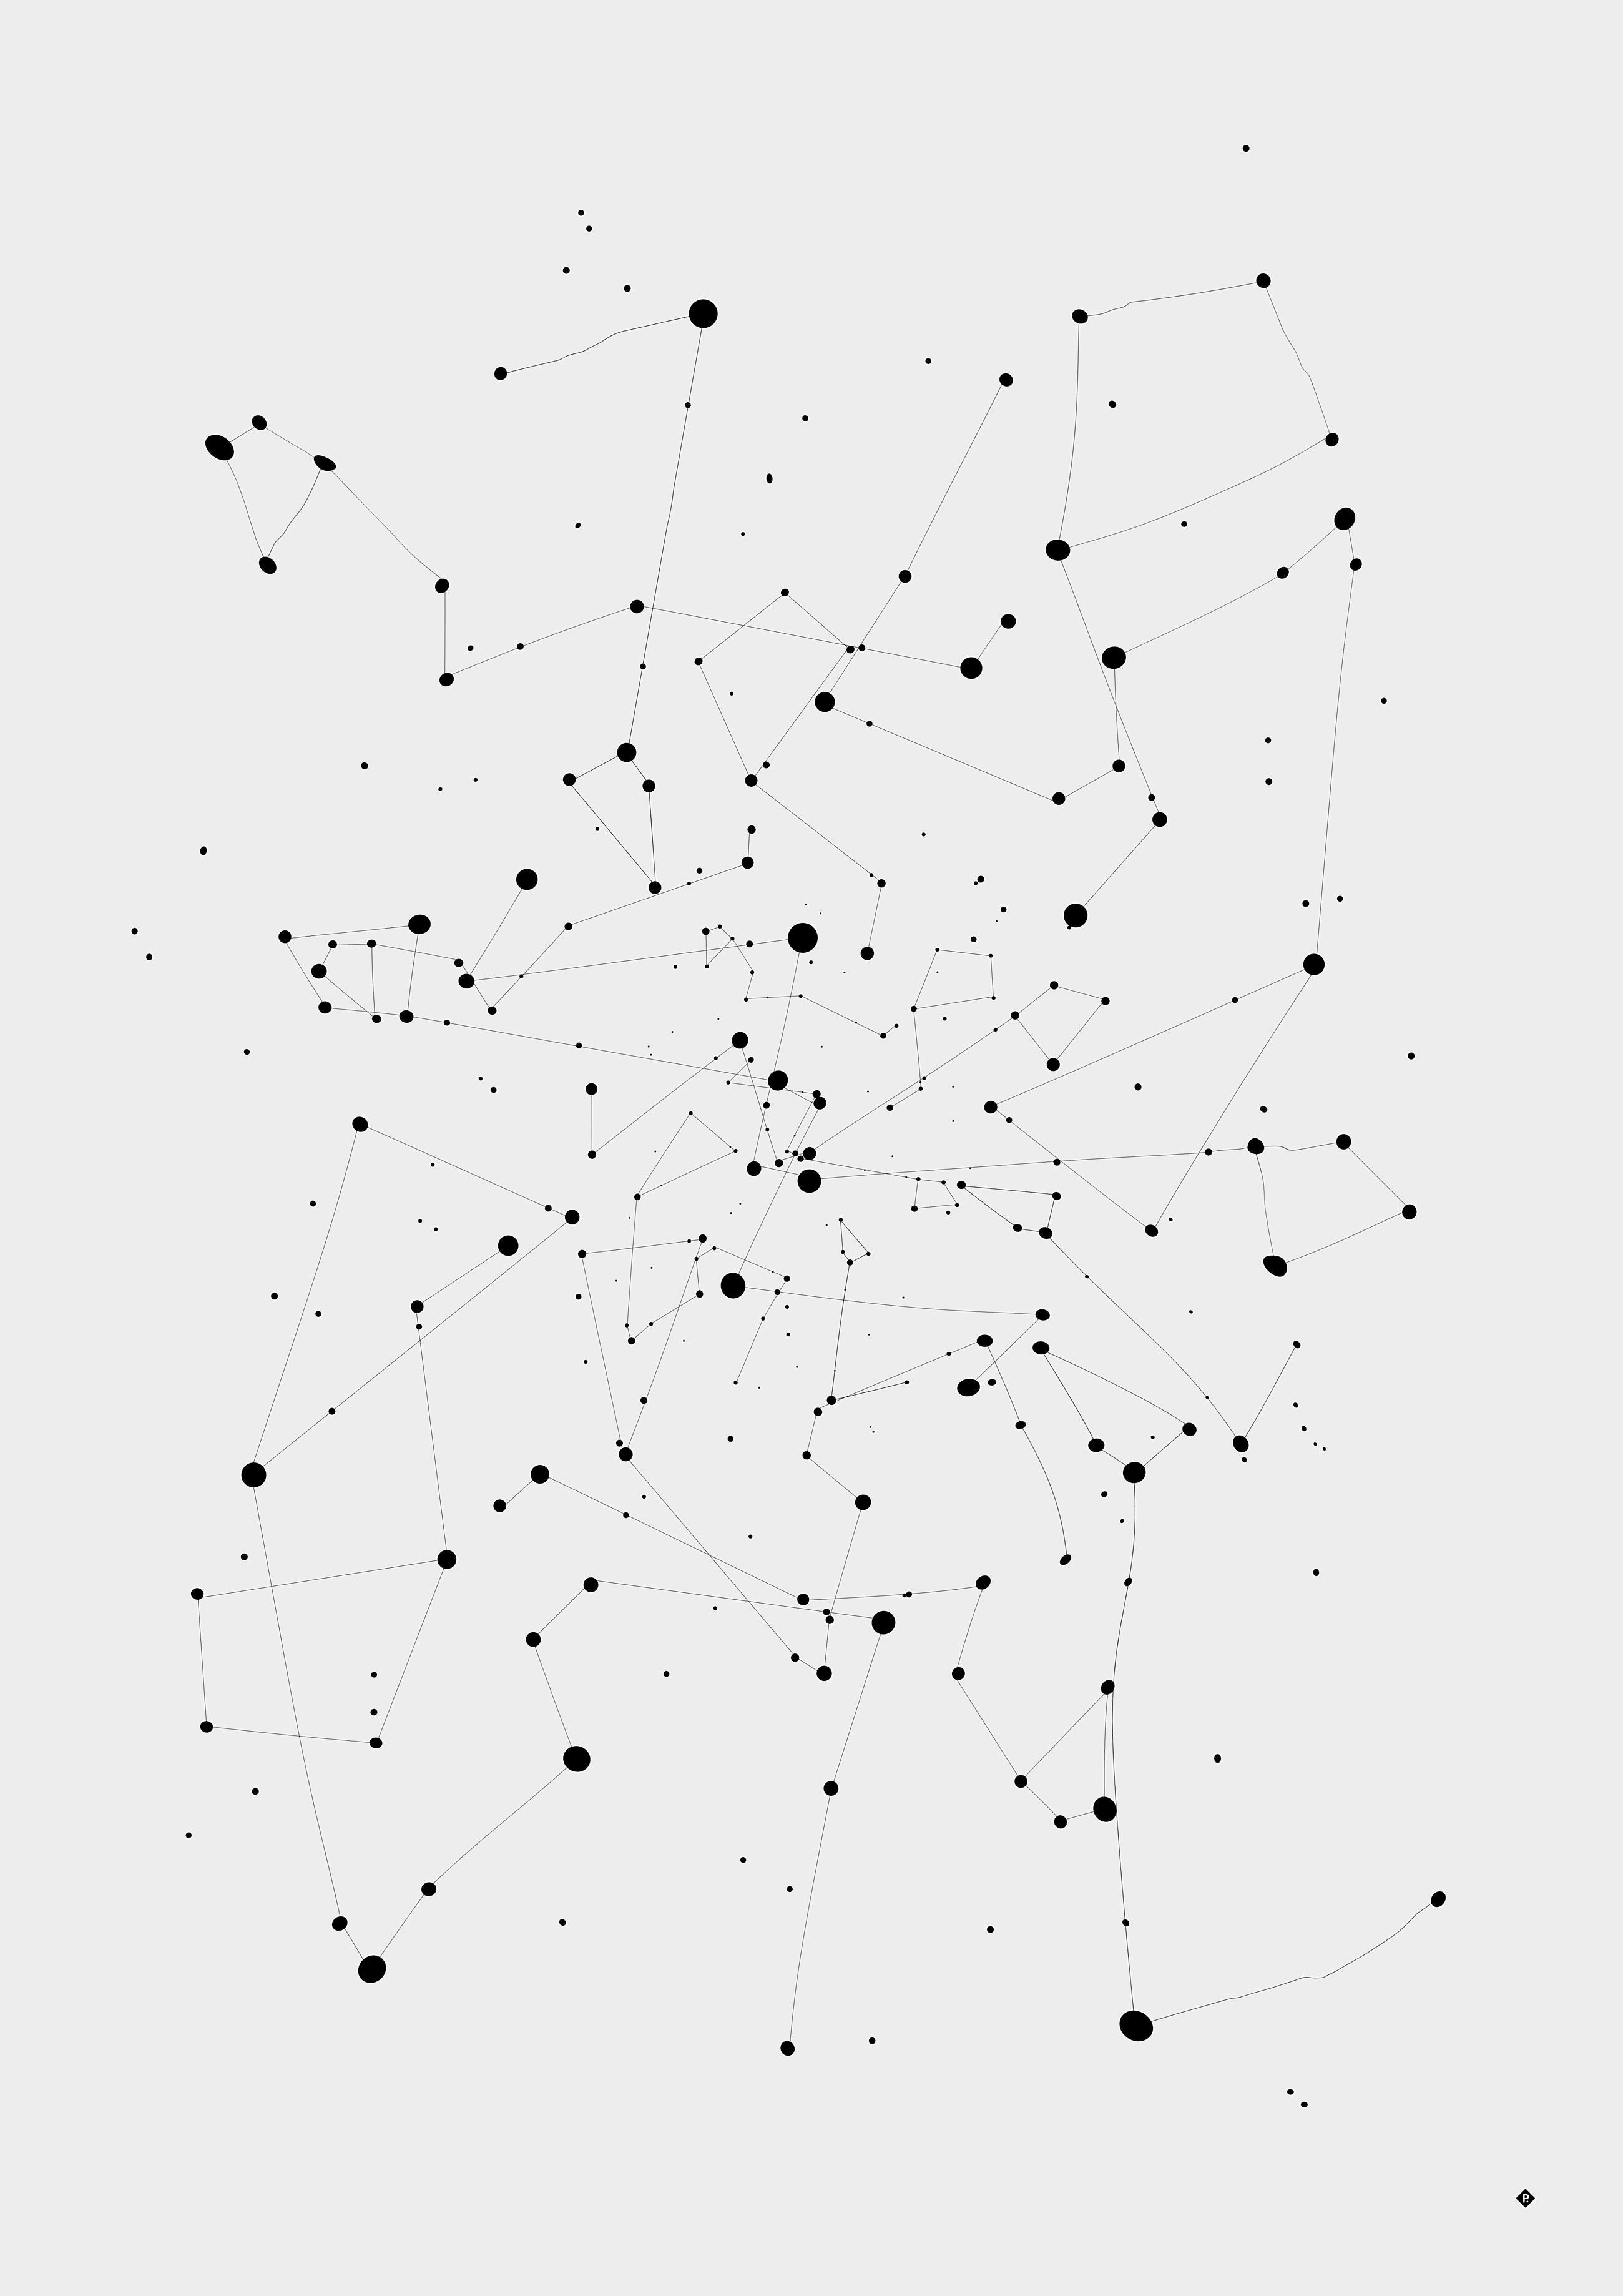 Segon Constellation II